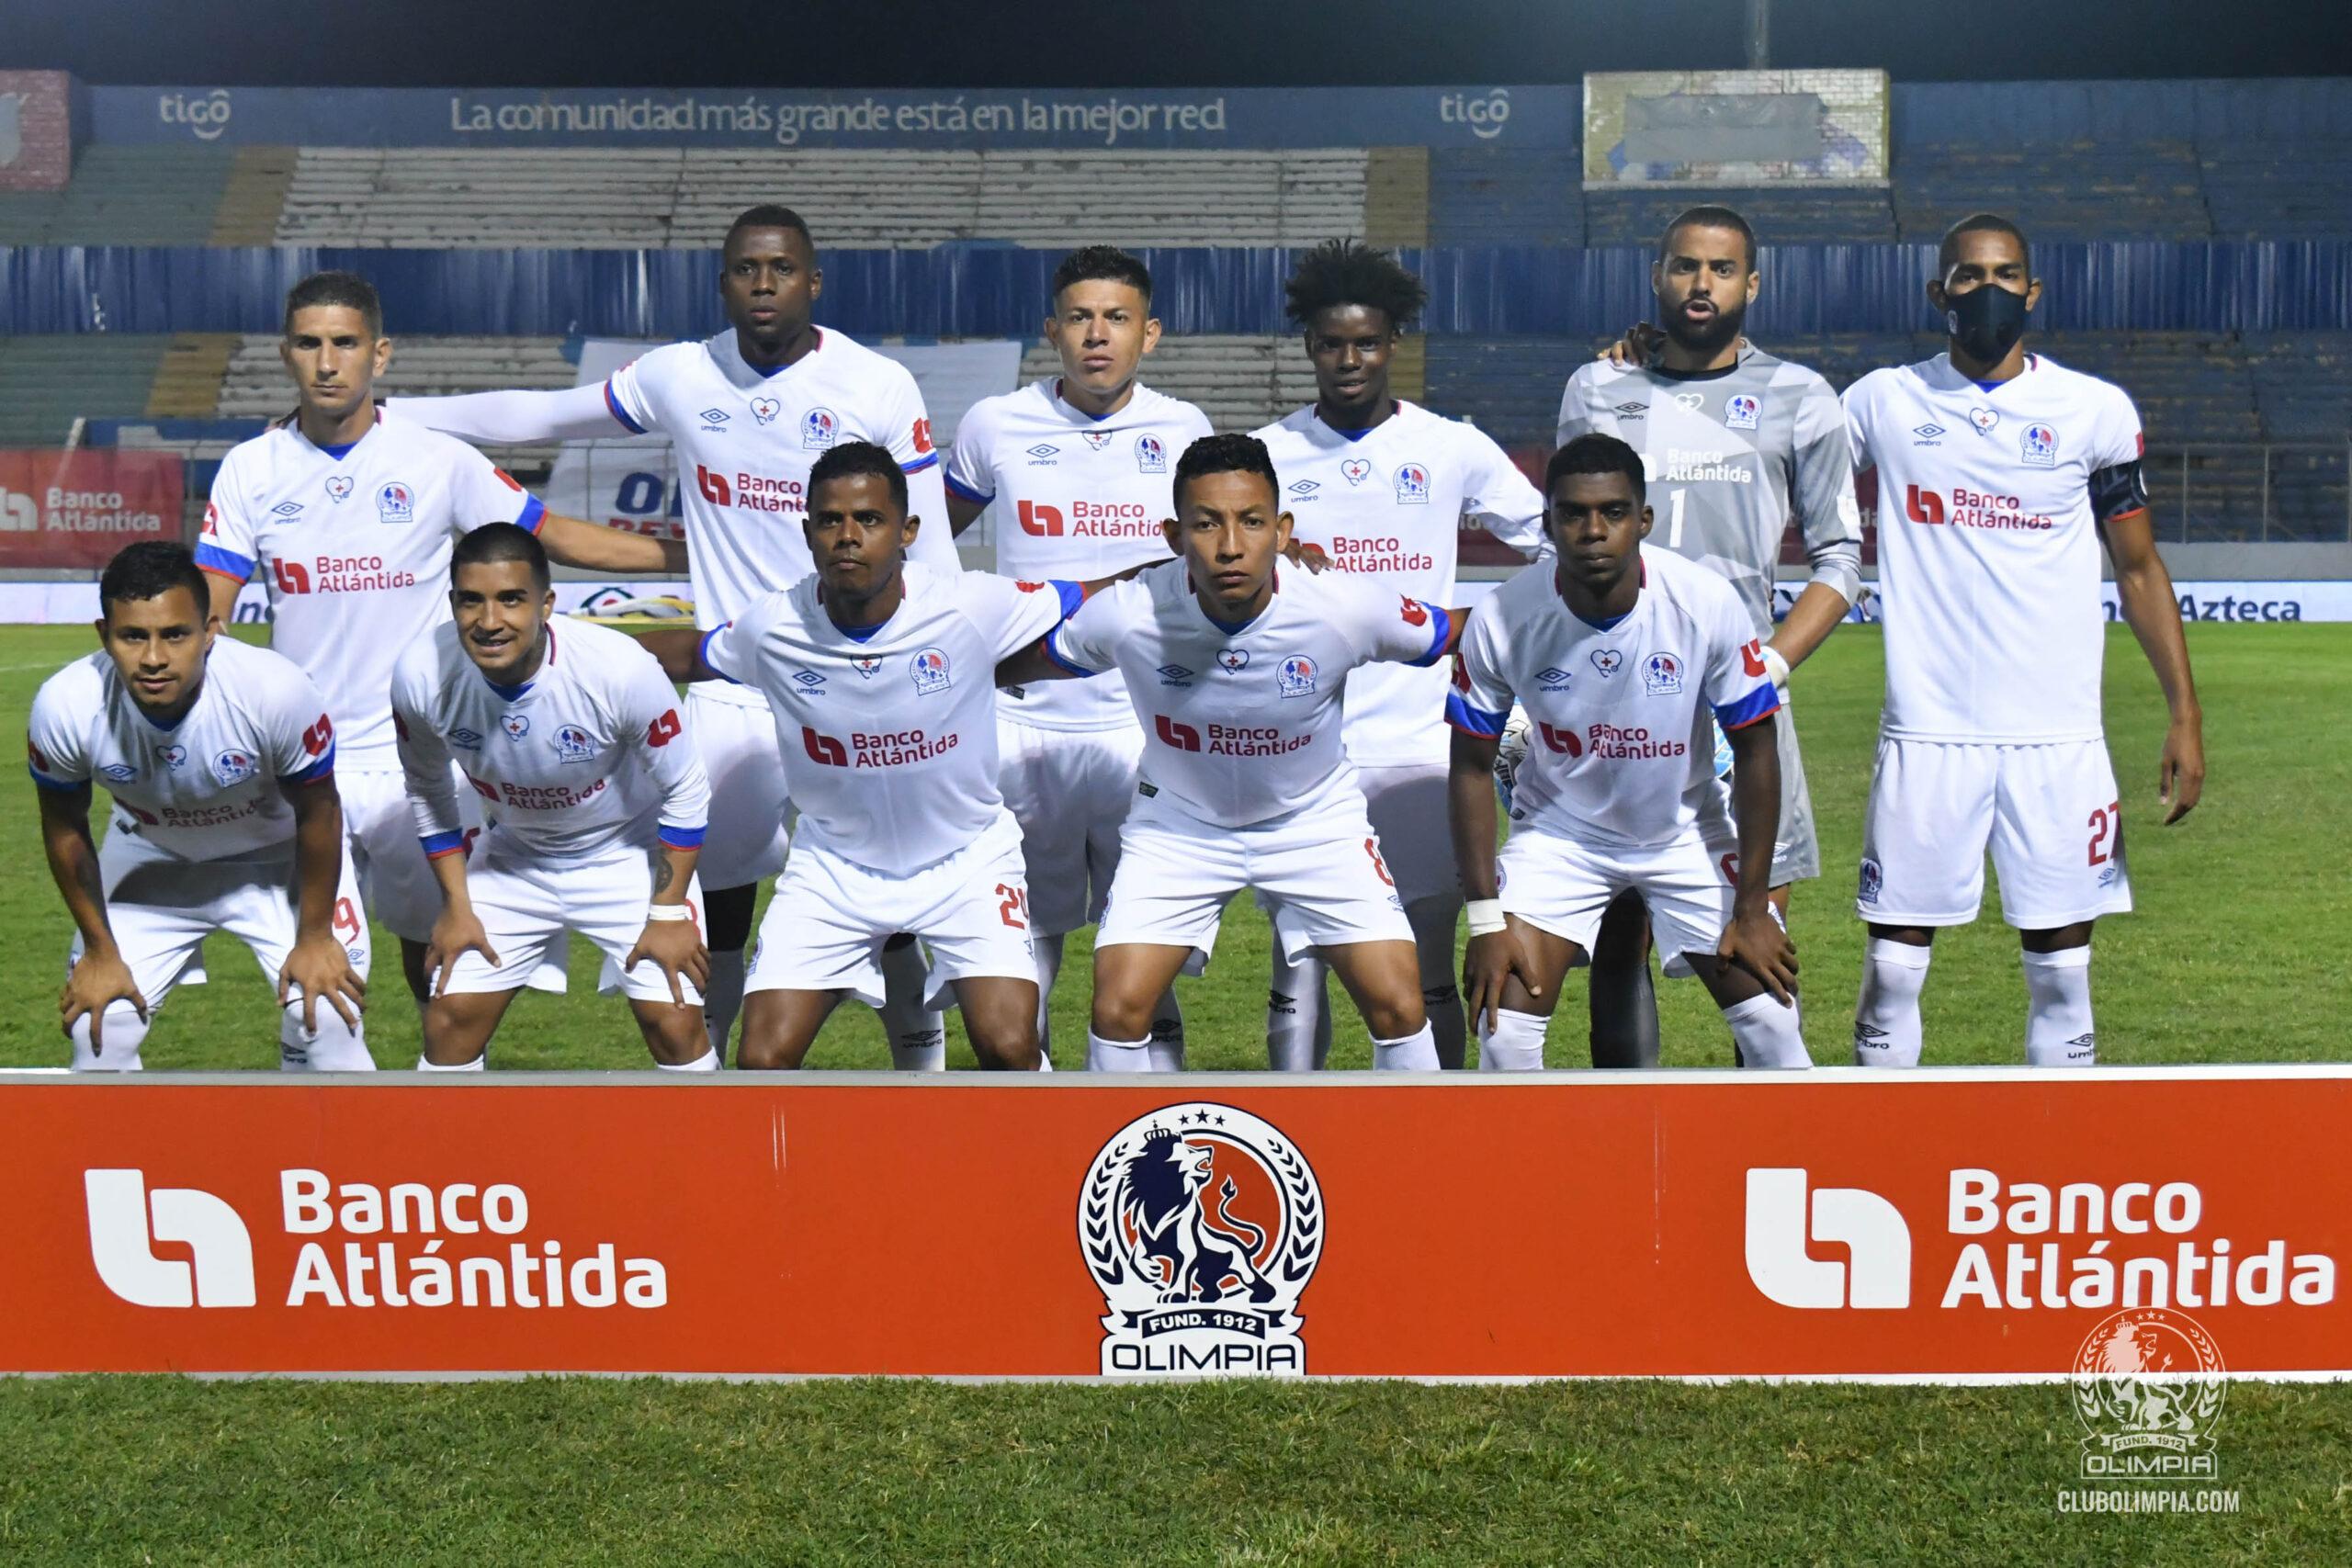 Olimpia 2-0 Real de Minas [Clausura 2020-2021]